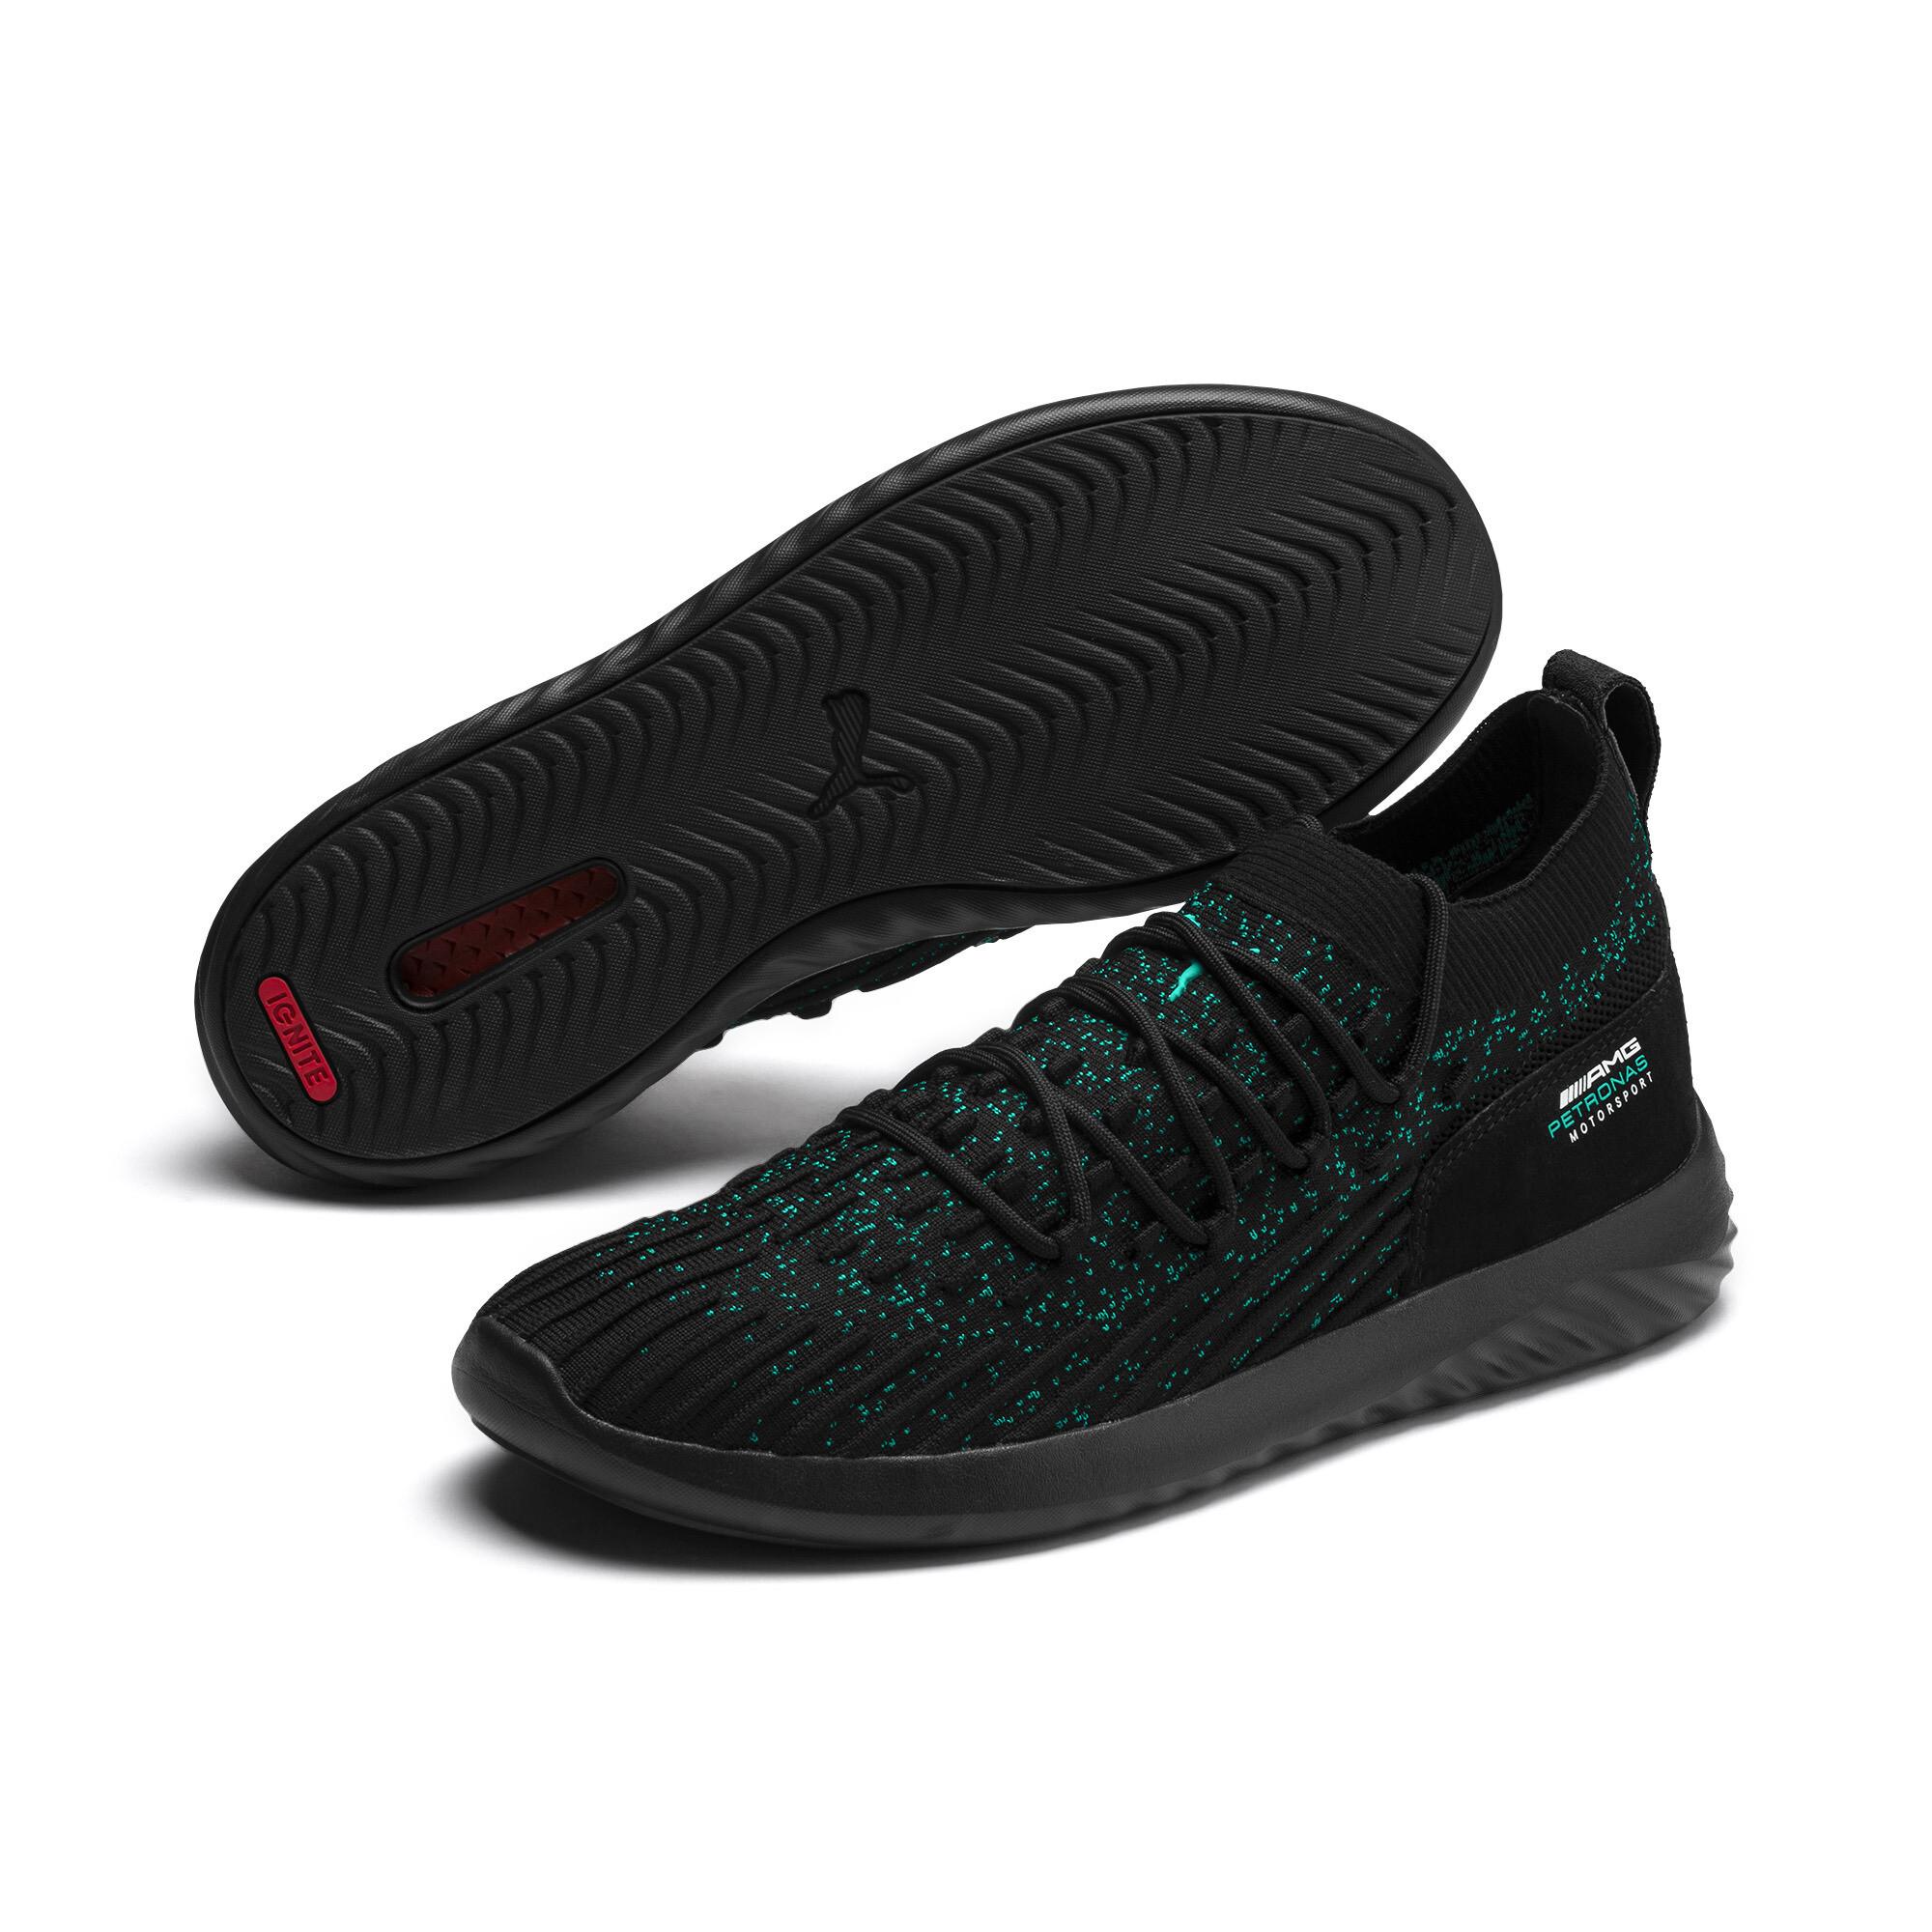 Details zu PUMA Mercedes AMG Petronas SpeedCat FUSEFIT Sneaker Unisex Schuhe Neu